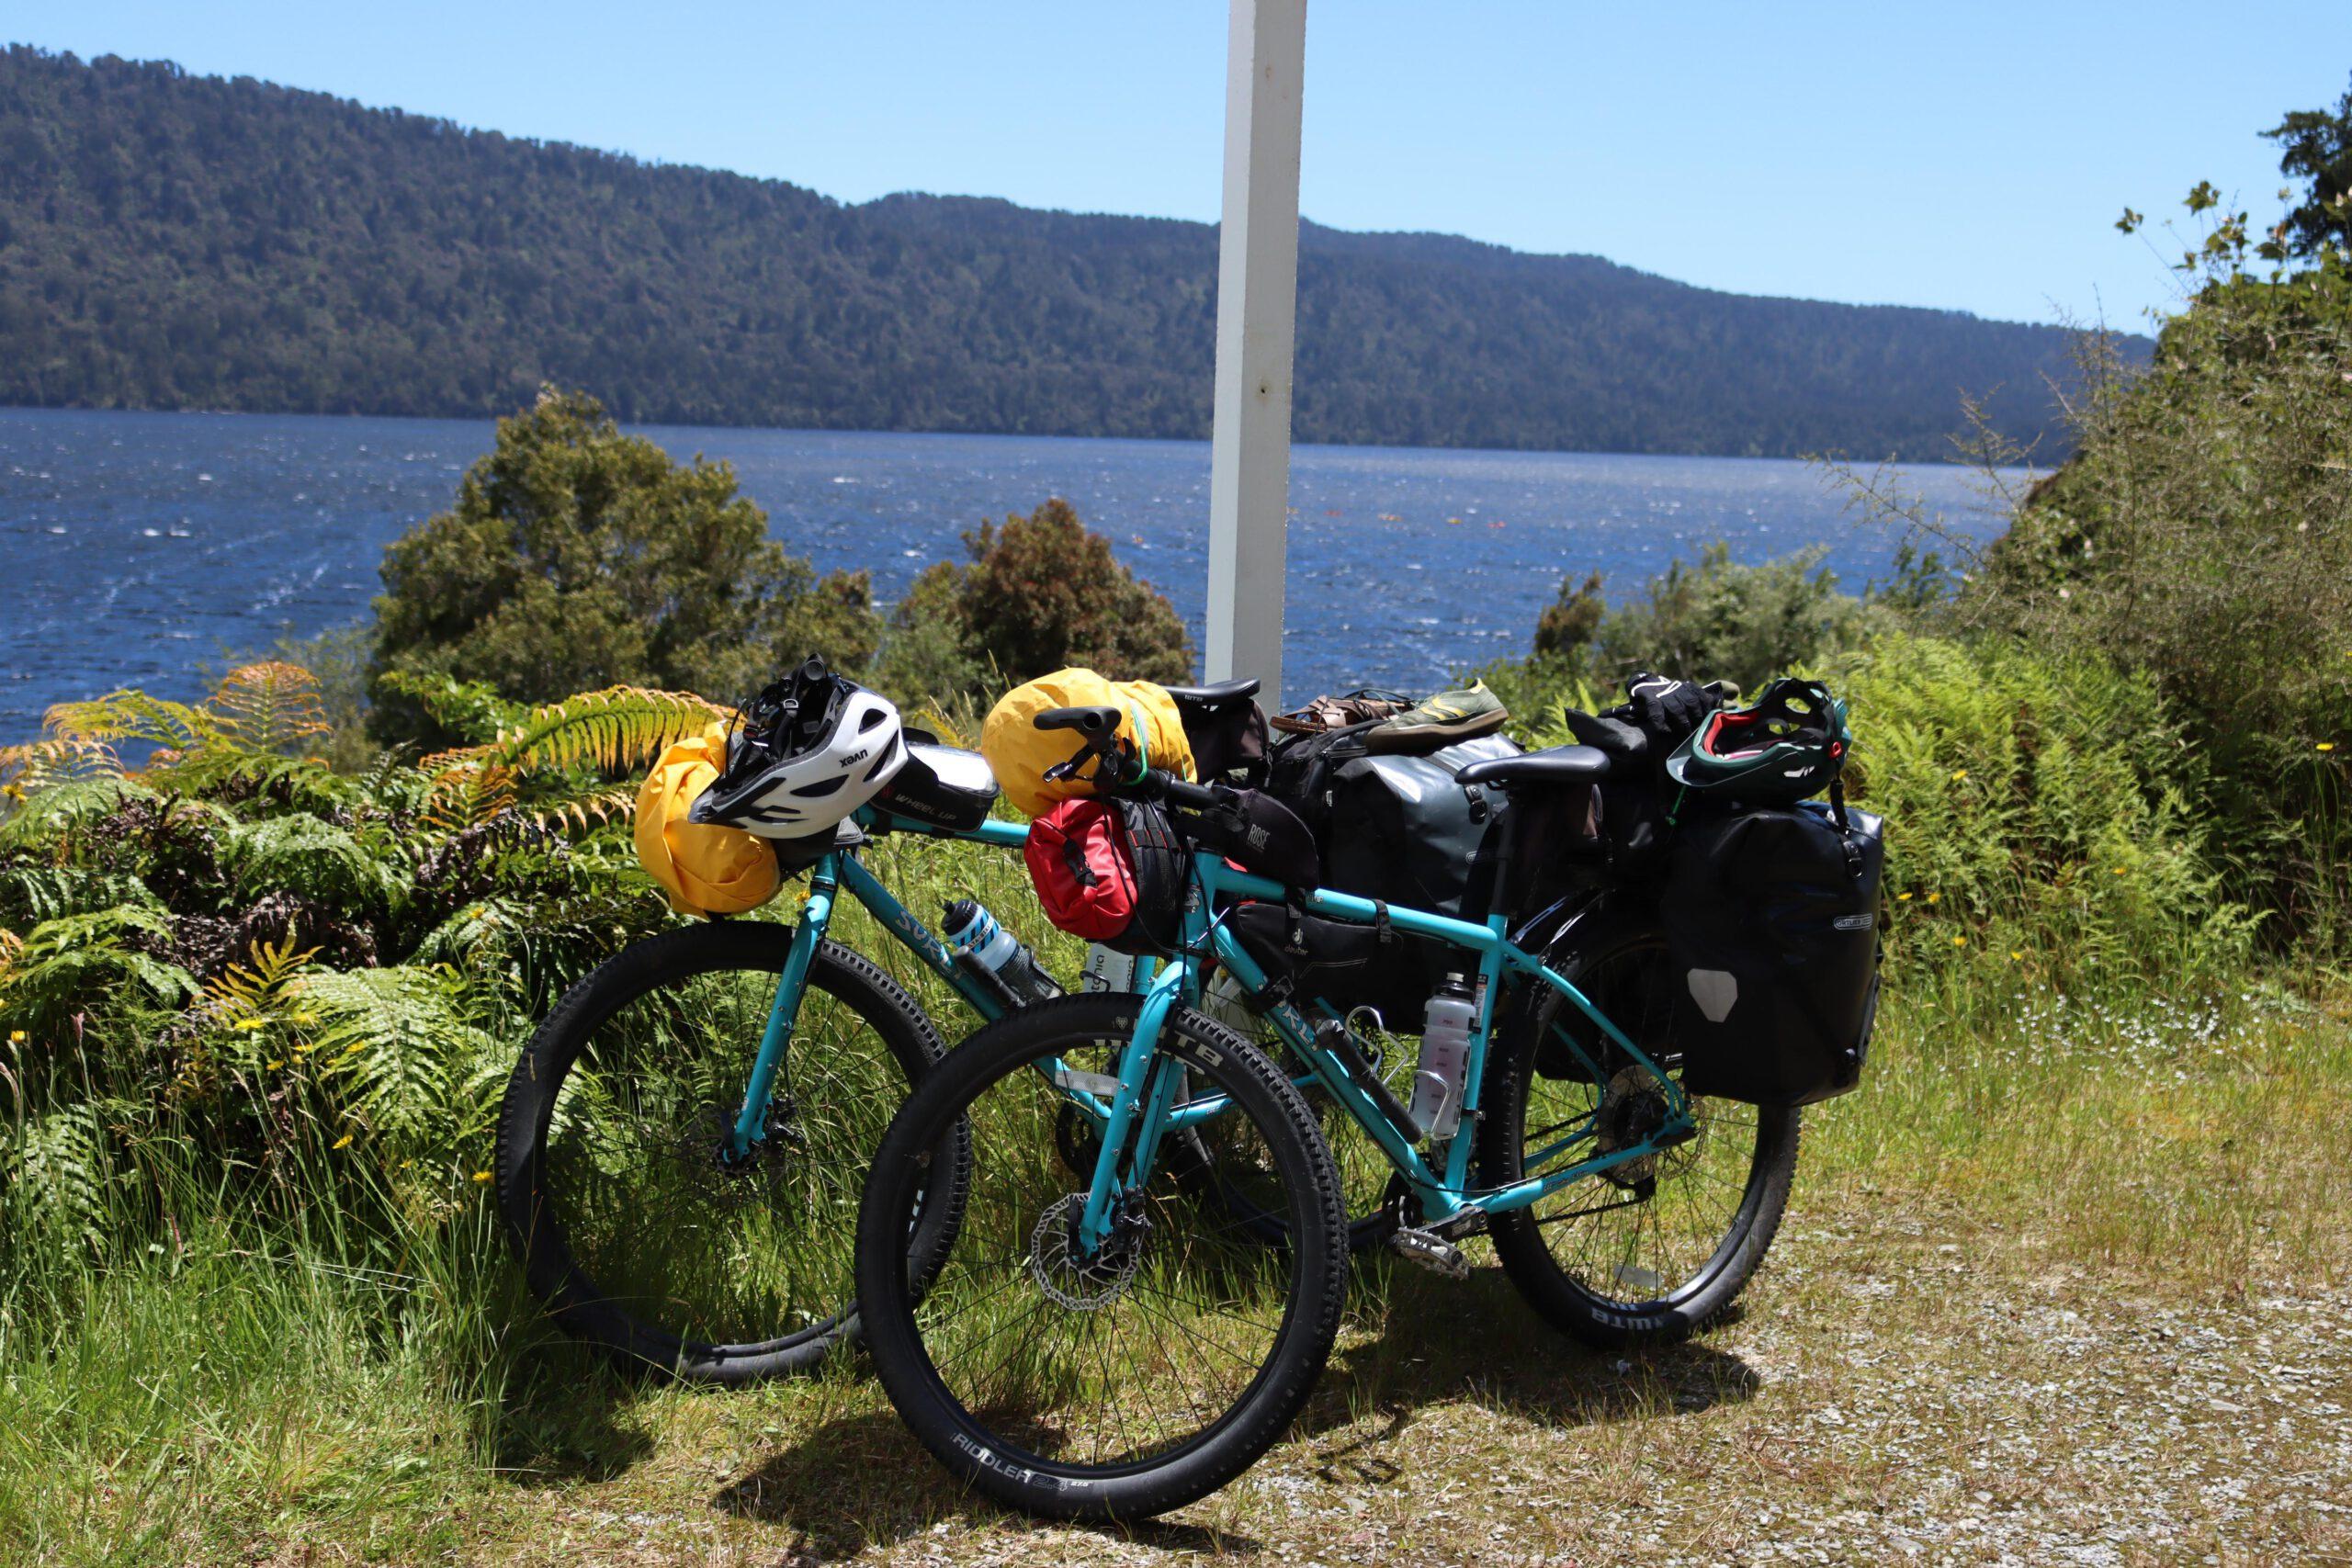 New Zealand 2019/20 Stage 4 – Harihari to Fox Glacier